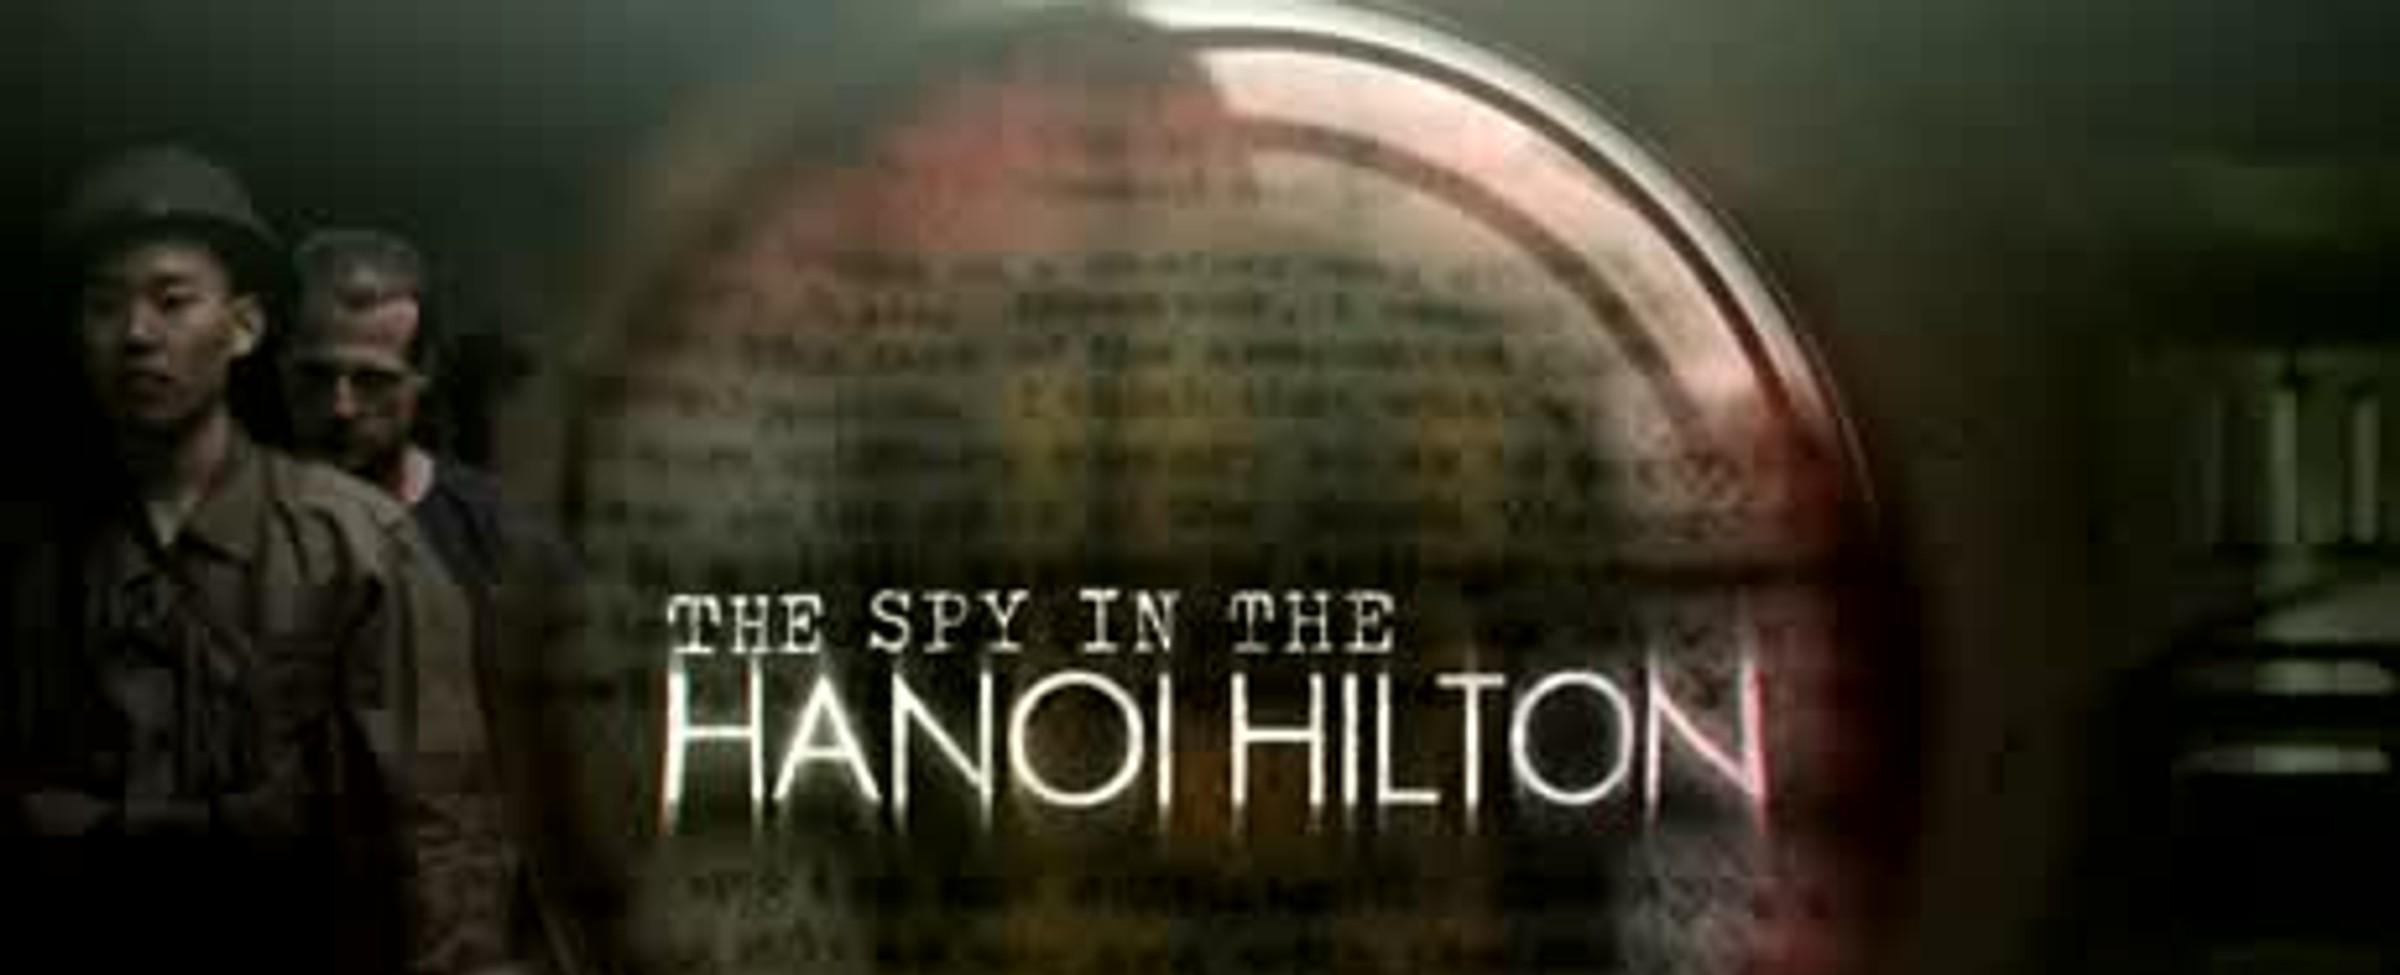 Špión v Hanojském Hiltonu